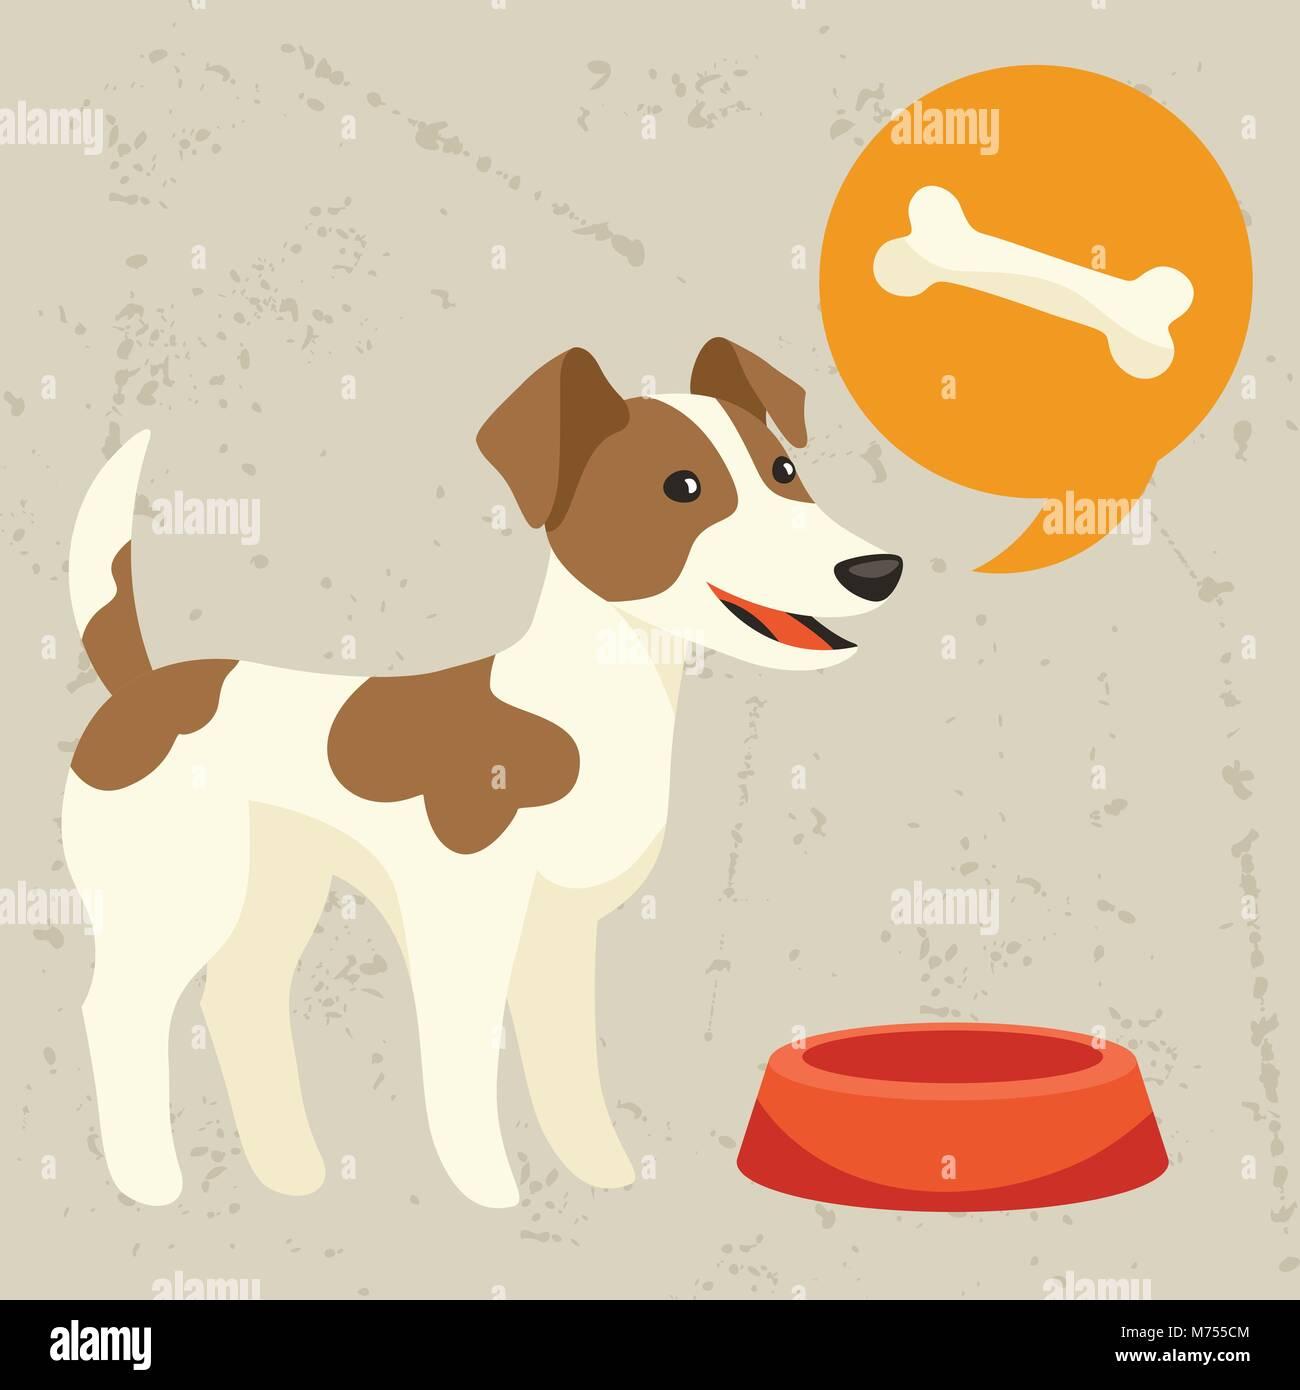 Cartoon Dog Bubble Stock Photos & Cartoon Dog Bubble Stock